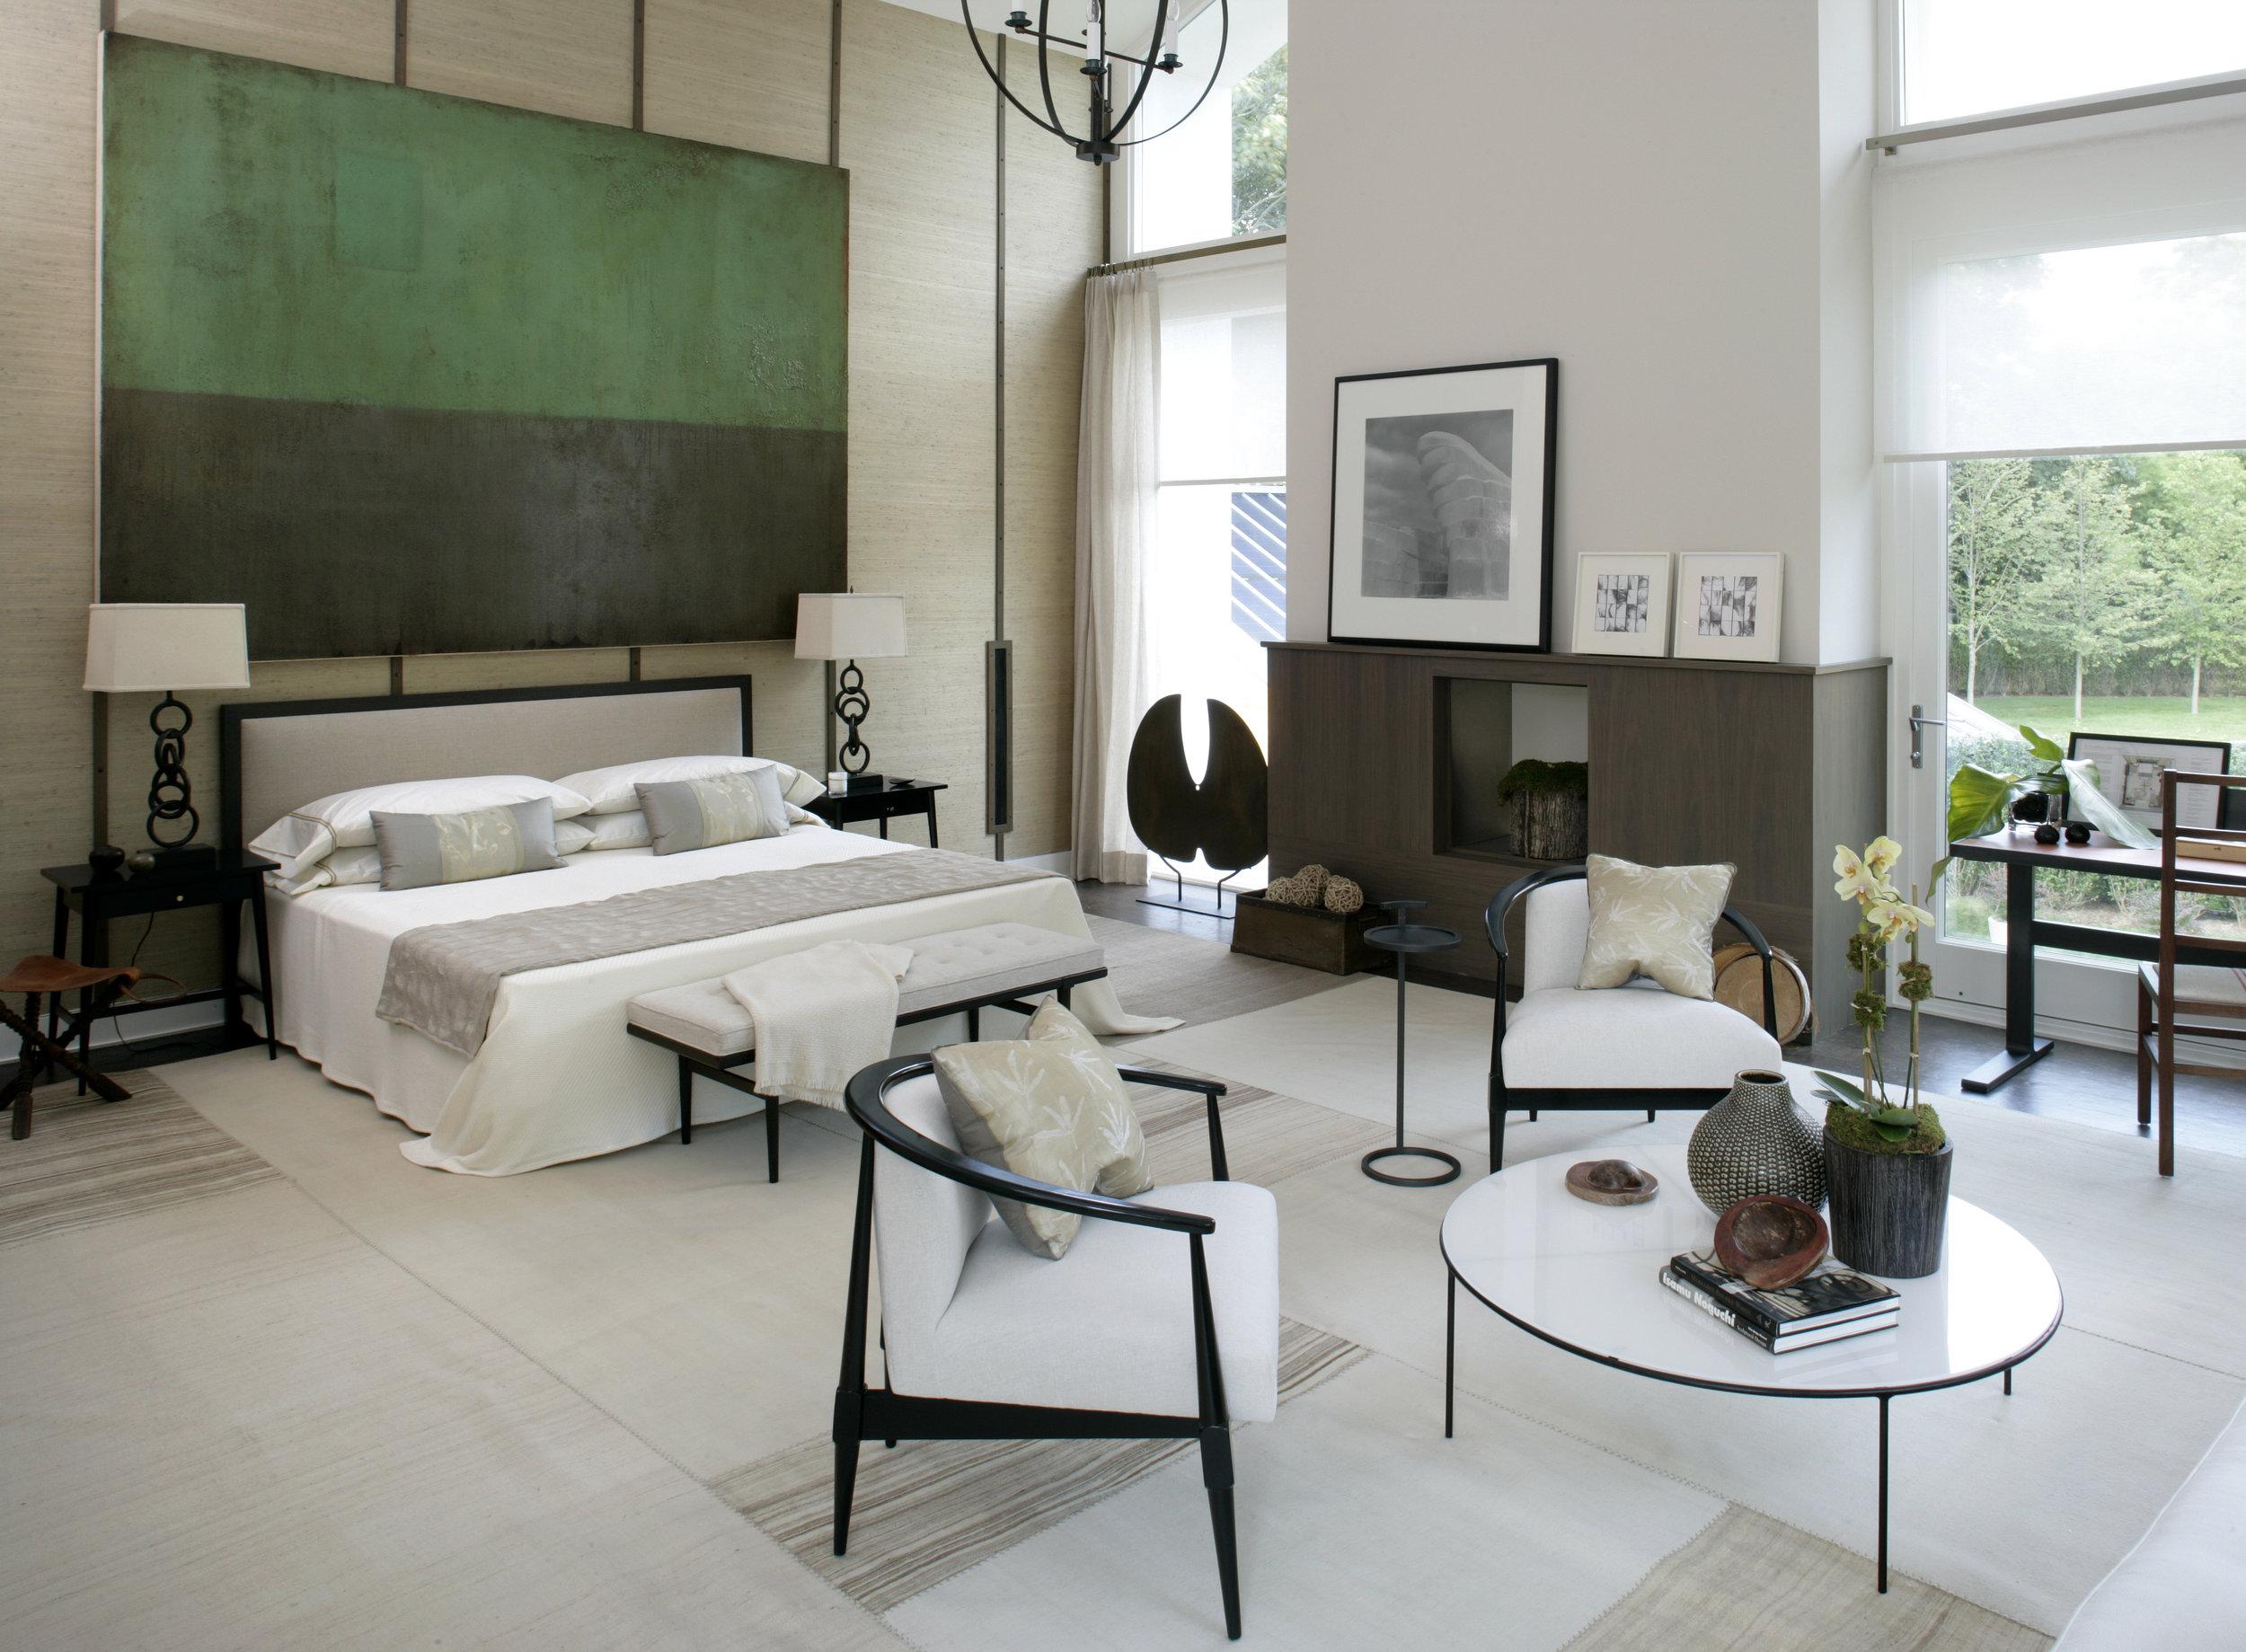 Artist: Antonio Murado, Interior Design: S. Russell Groves